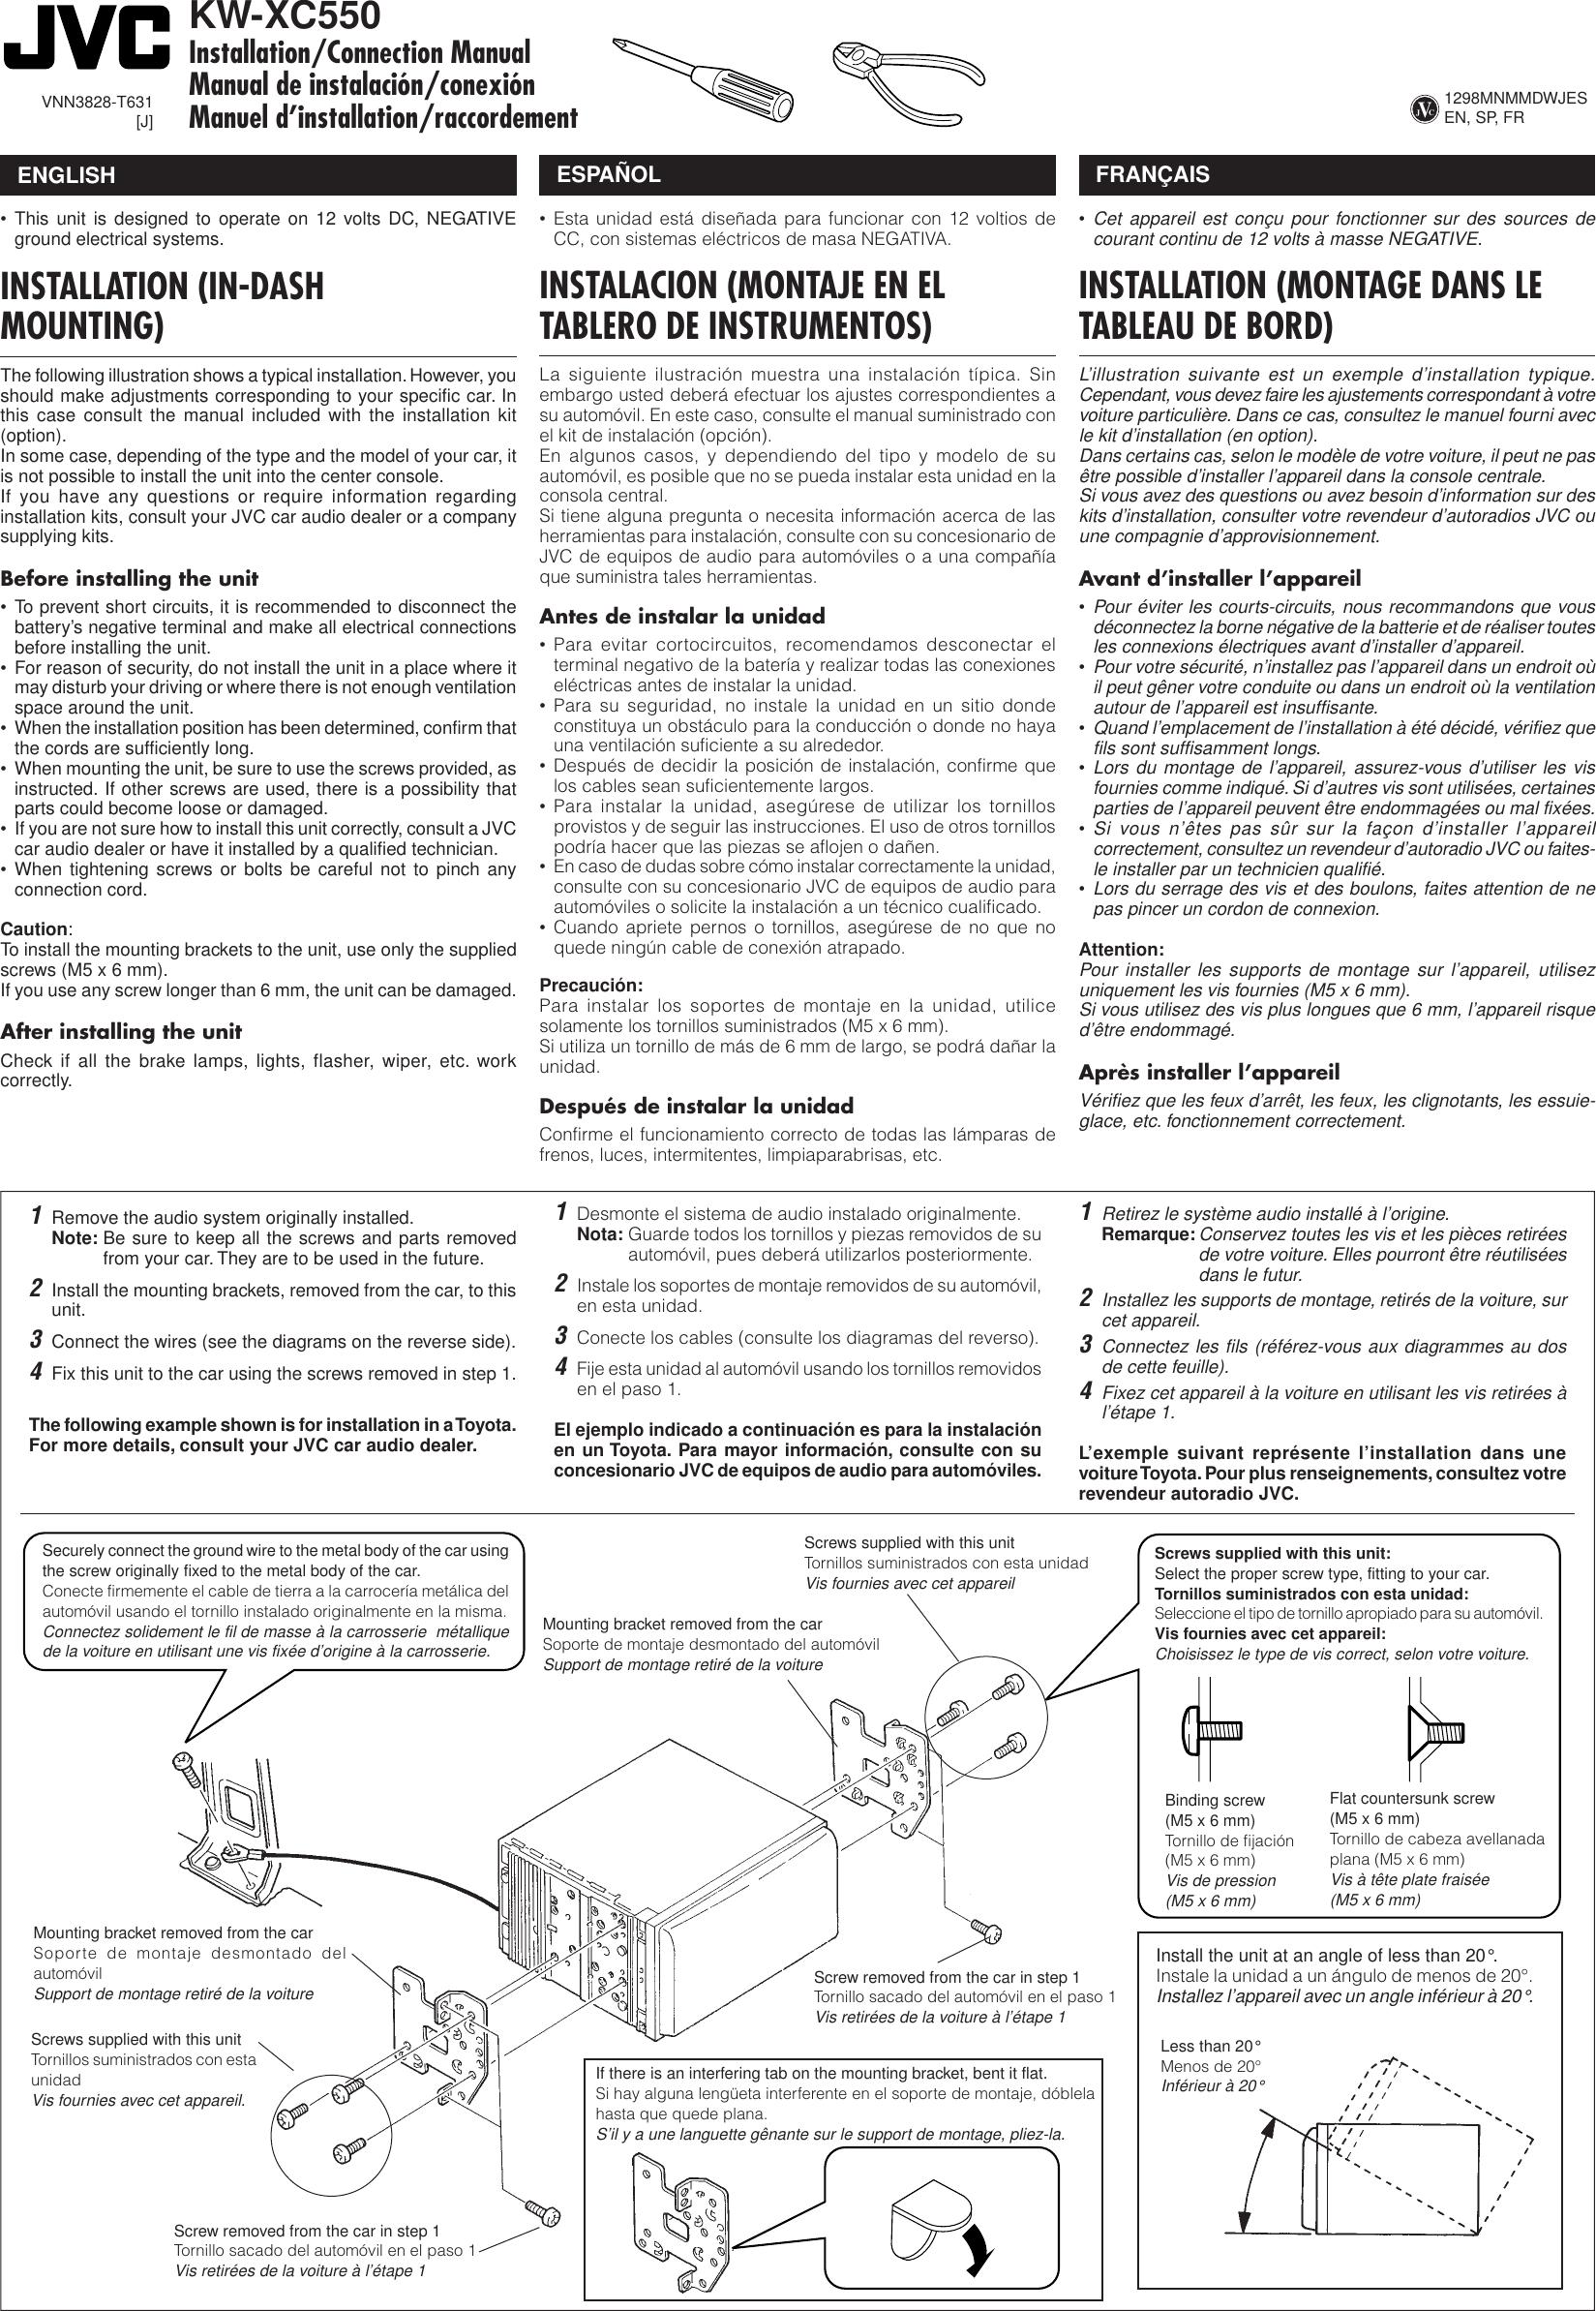 [DIAGRAM_38EU]  Jvc Kw Xc550 Installation Manual | Jvc Kw Wiring Diagram |  | UserManual.wiki